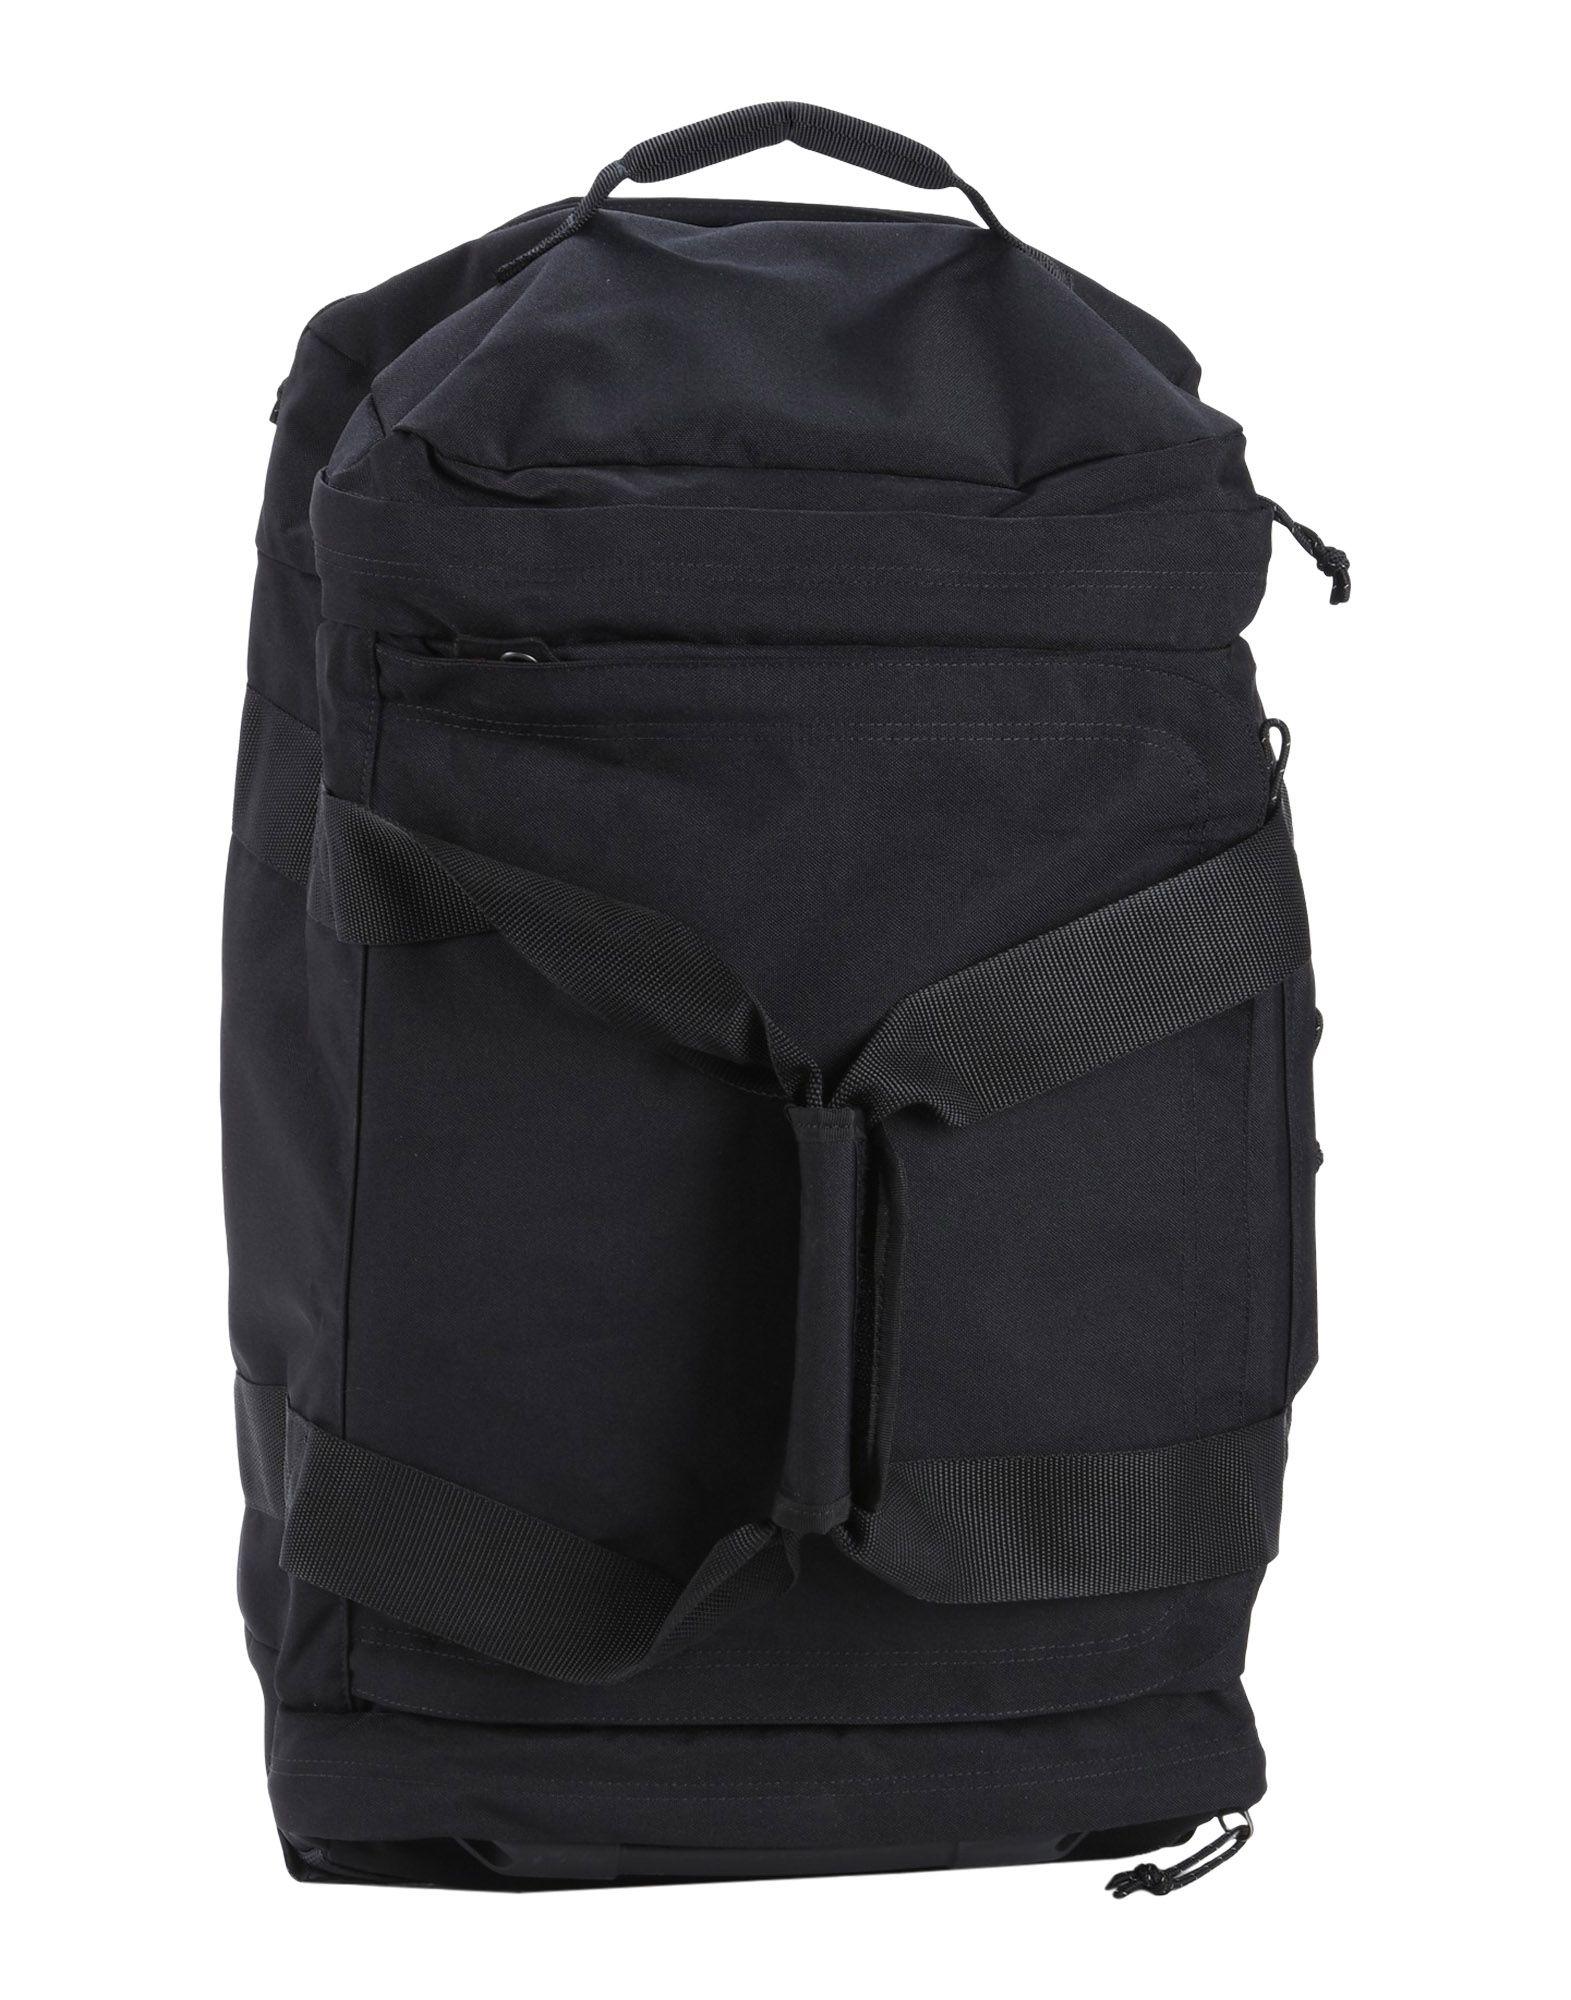 EASTPAK Чемодан/сумка на колесиках чемодан samsonite чемодан 55 см base boost